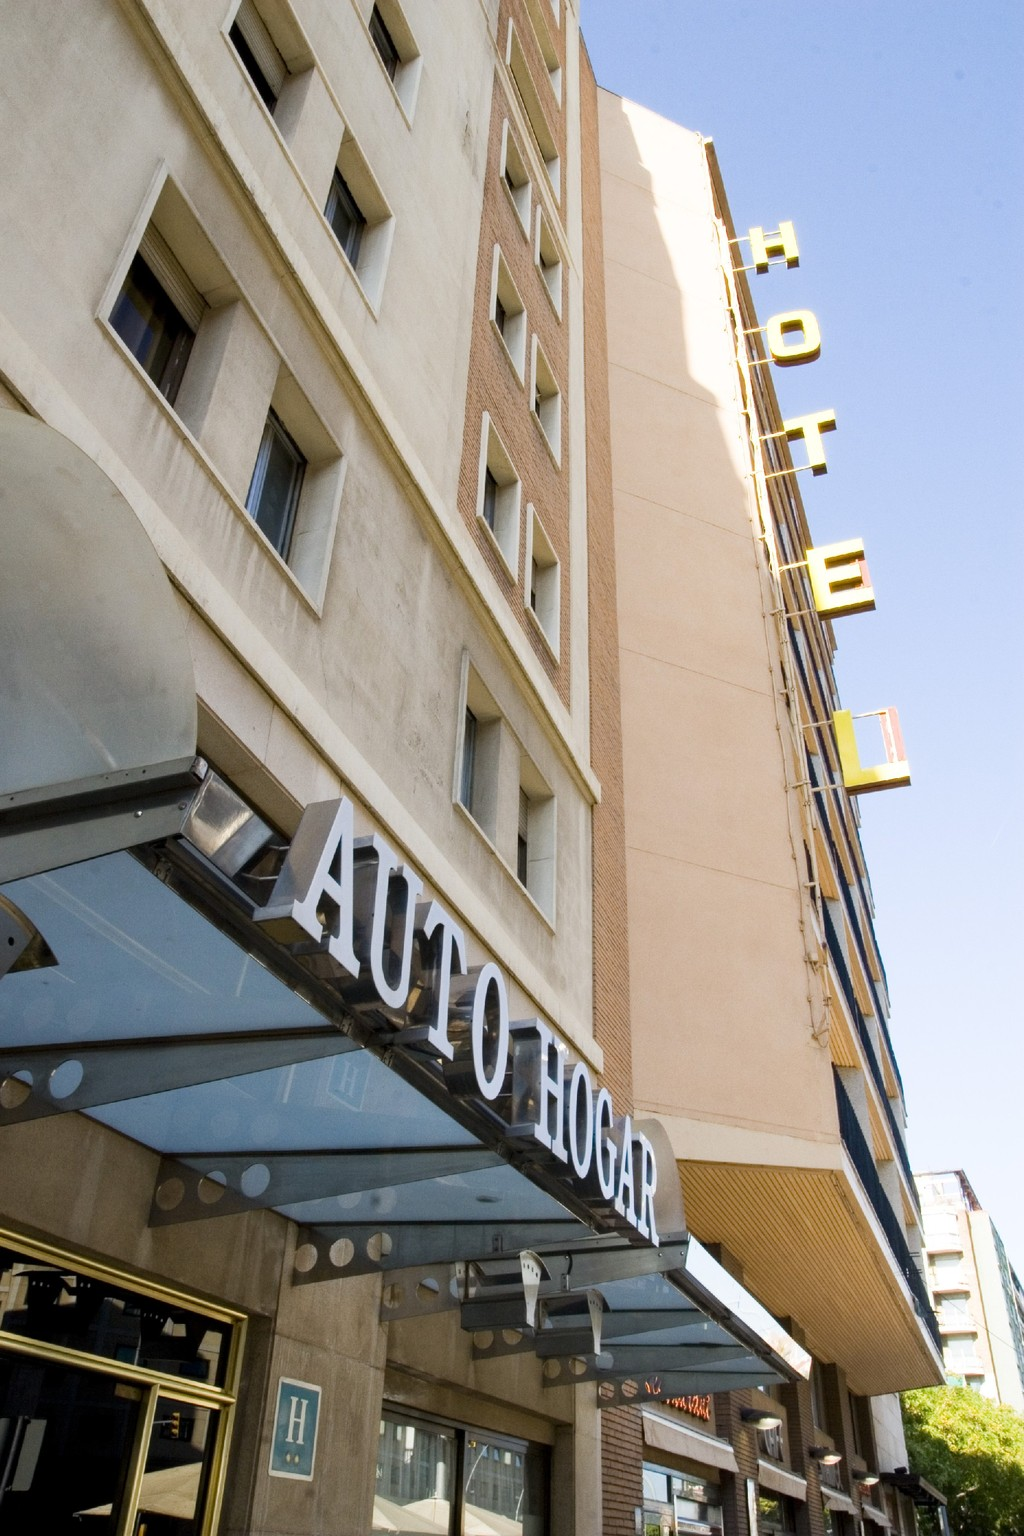 Hotel auto hogar barcelona spain for Hotel search